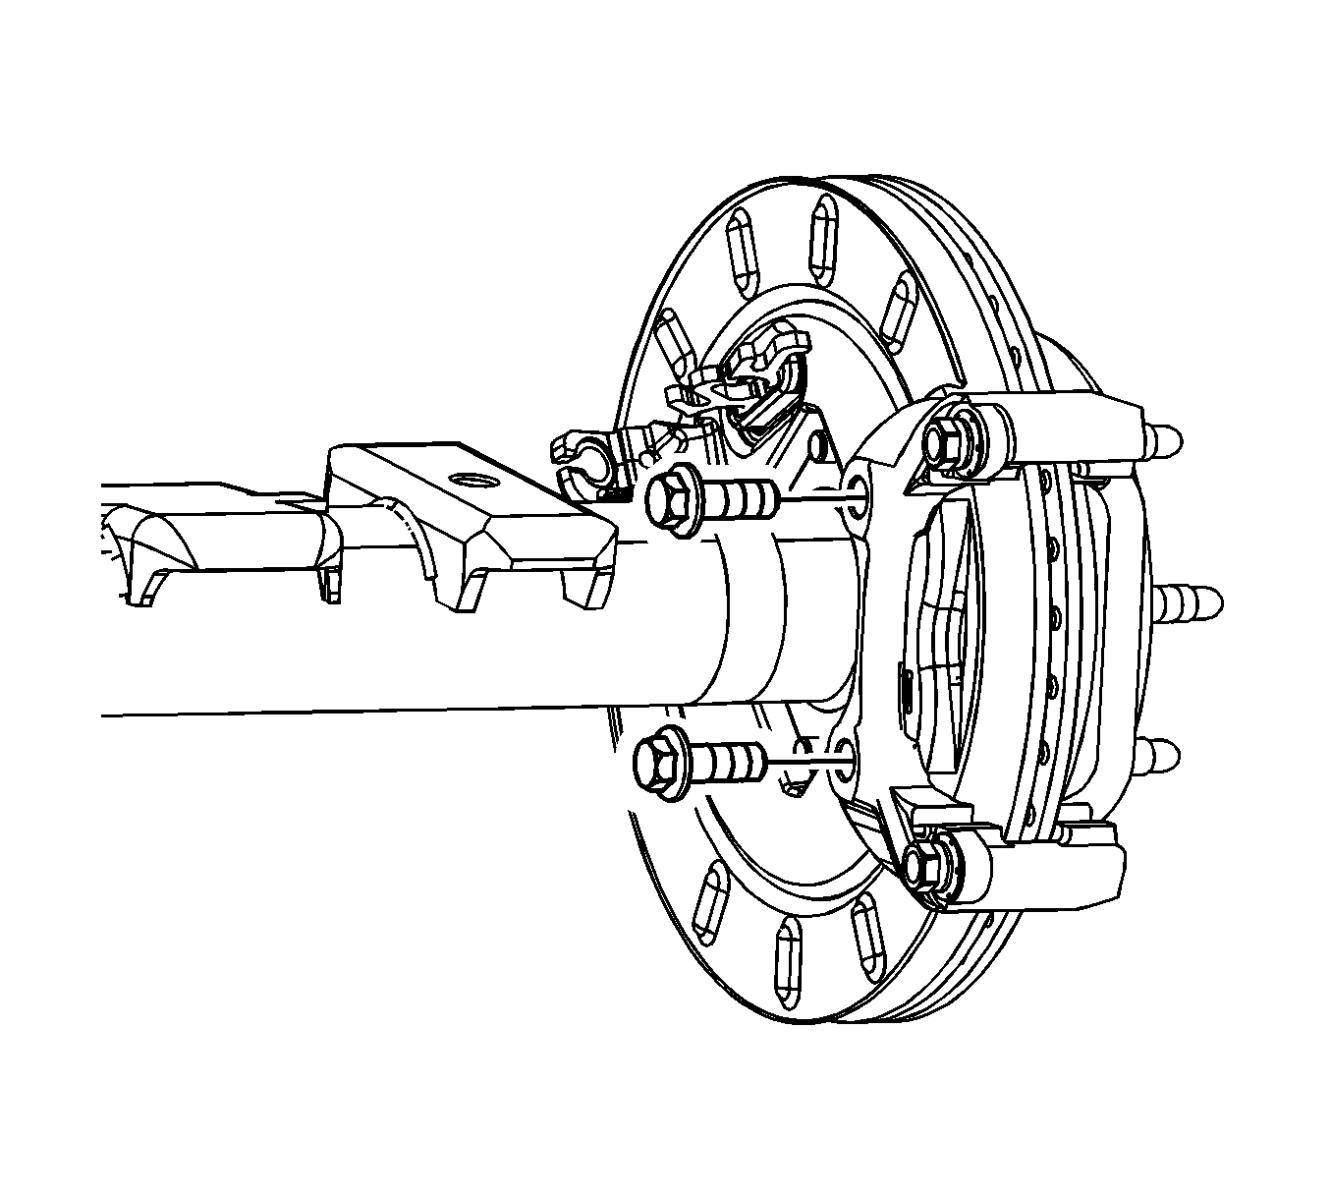 Fmvss Noncompliance Rear Brake Caliper Bracket